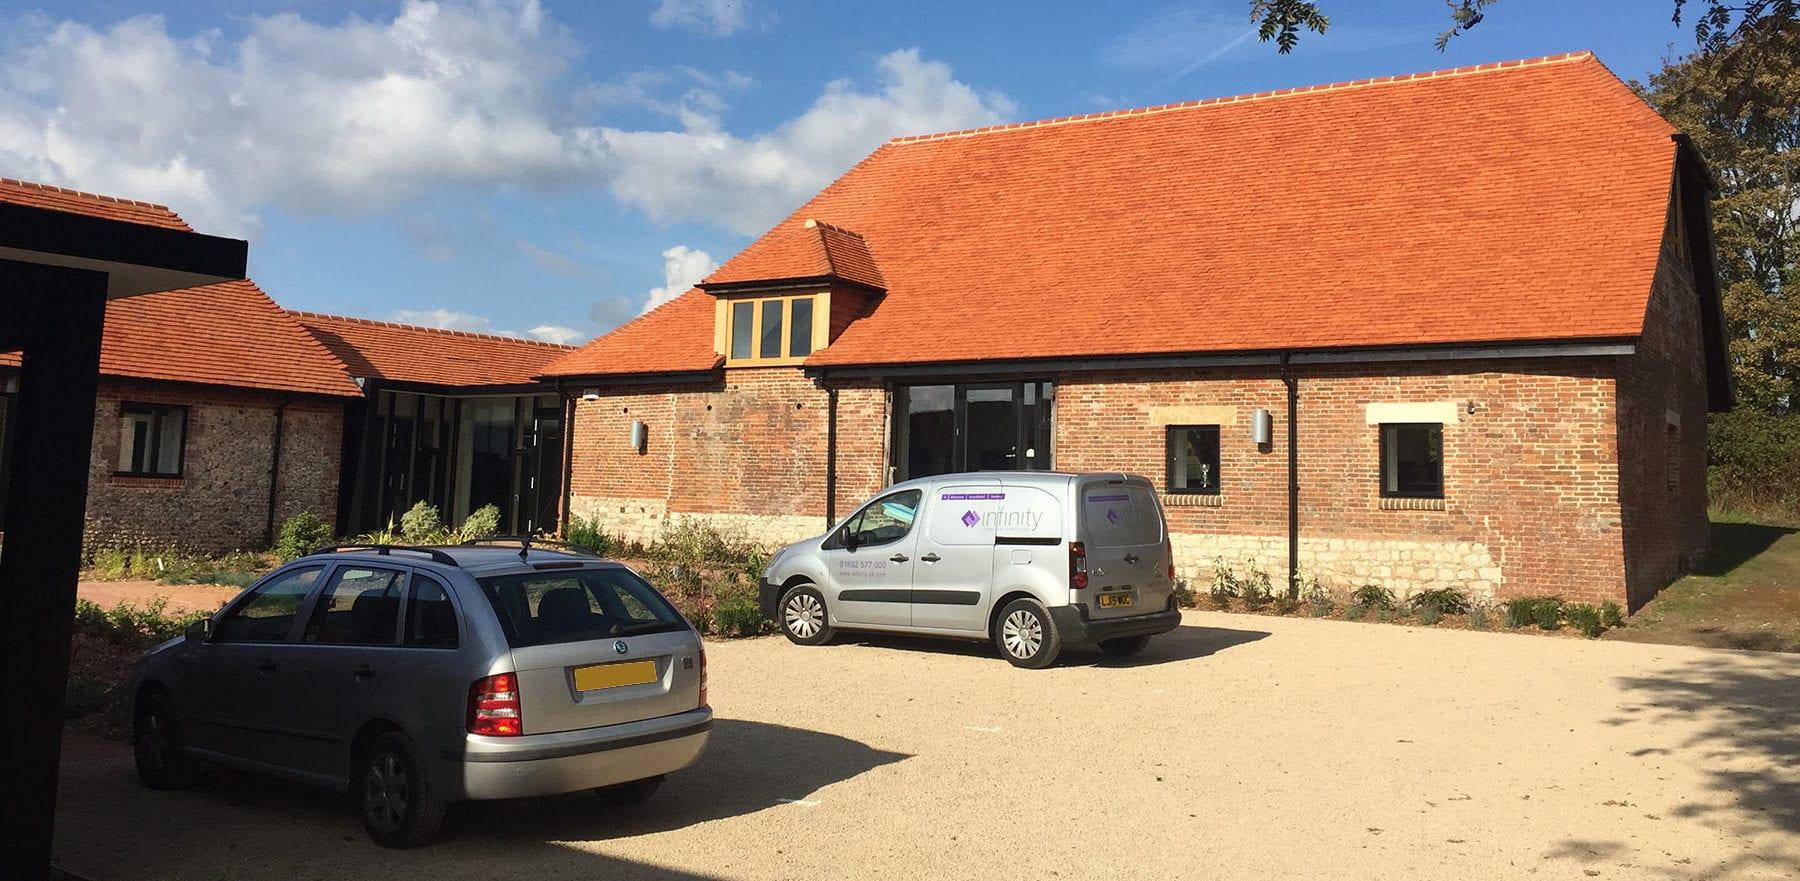 Lifestiles - Handcrafted Pentlow Clay Roof Tiles - Petersfield, England 2